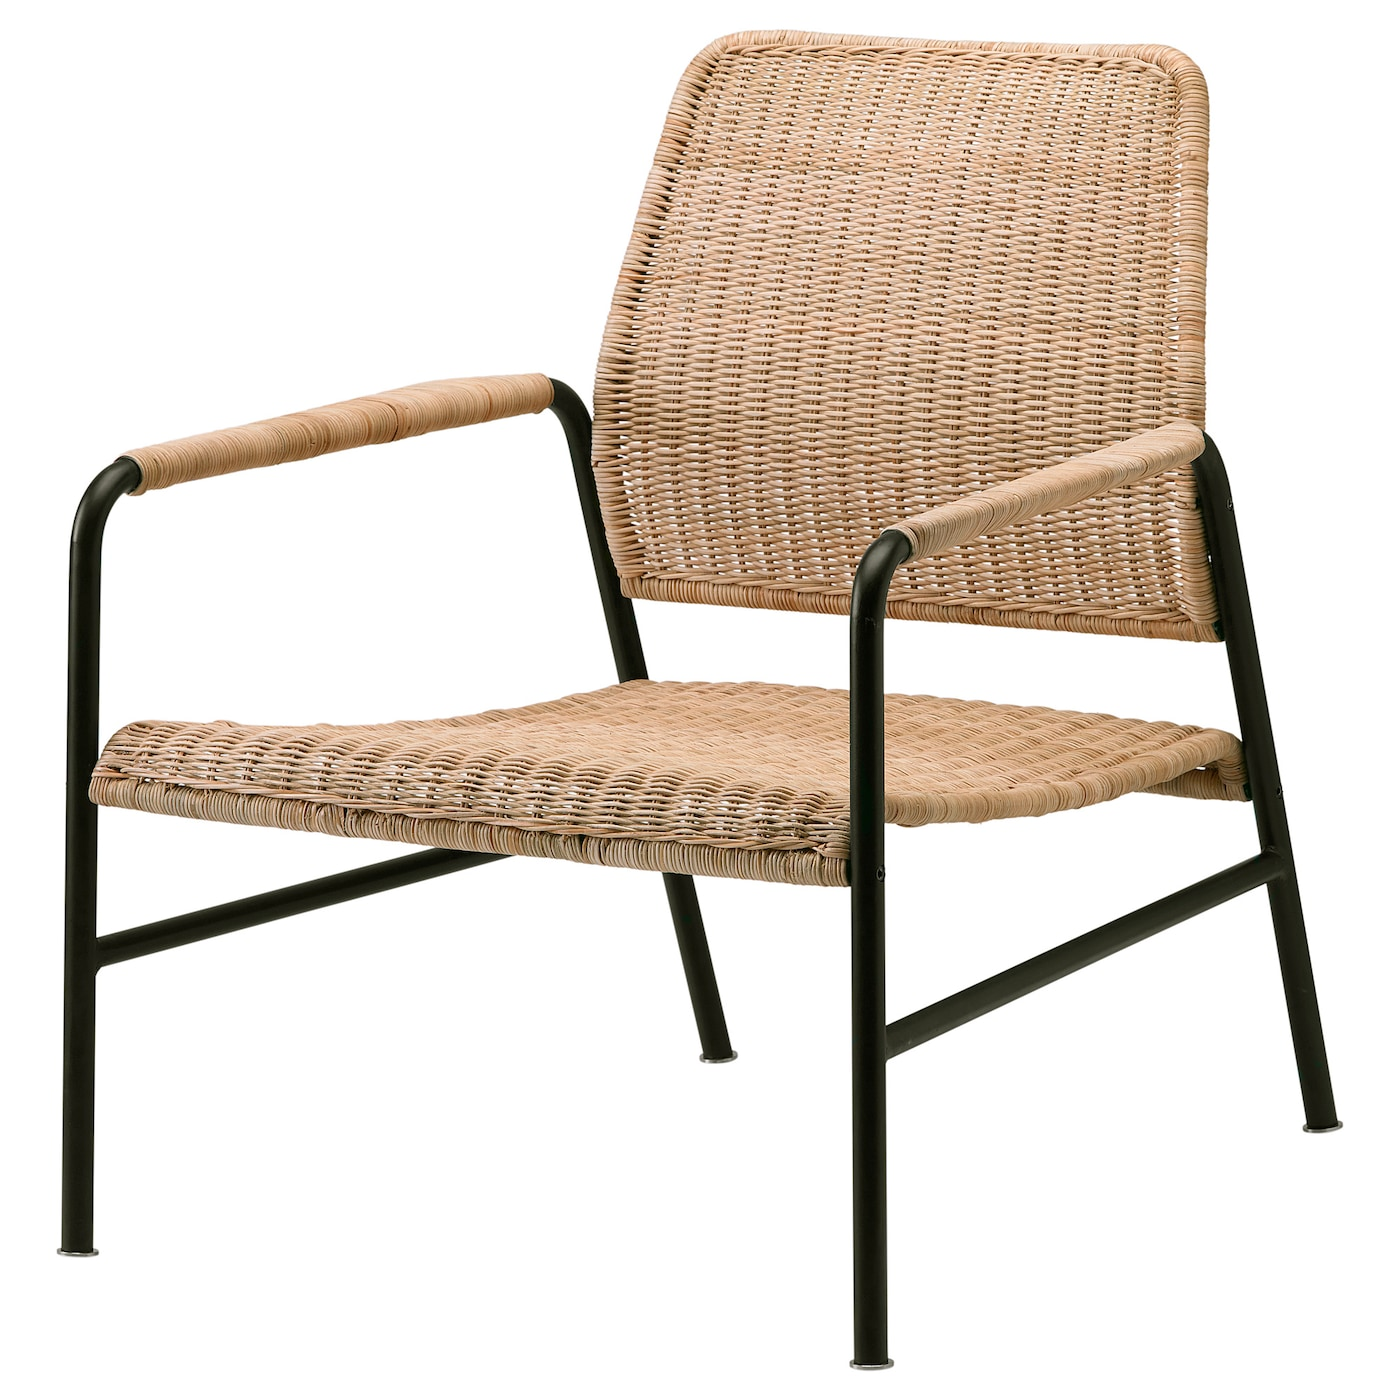 IKEA ULRIKSBERG Fotel, rattan, antracyt